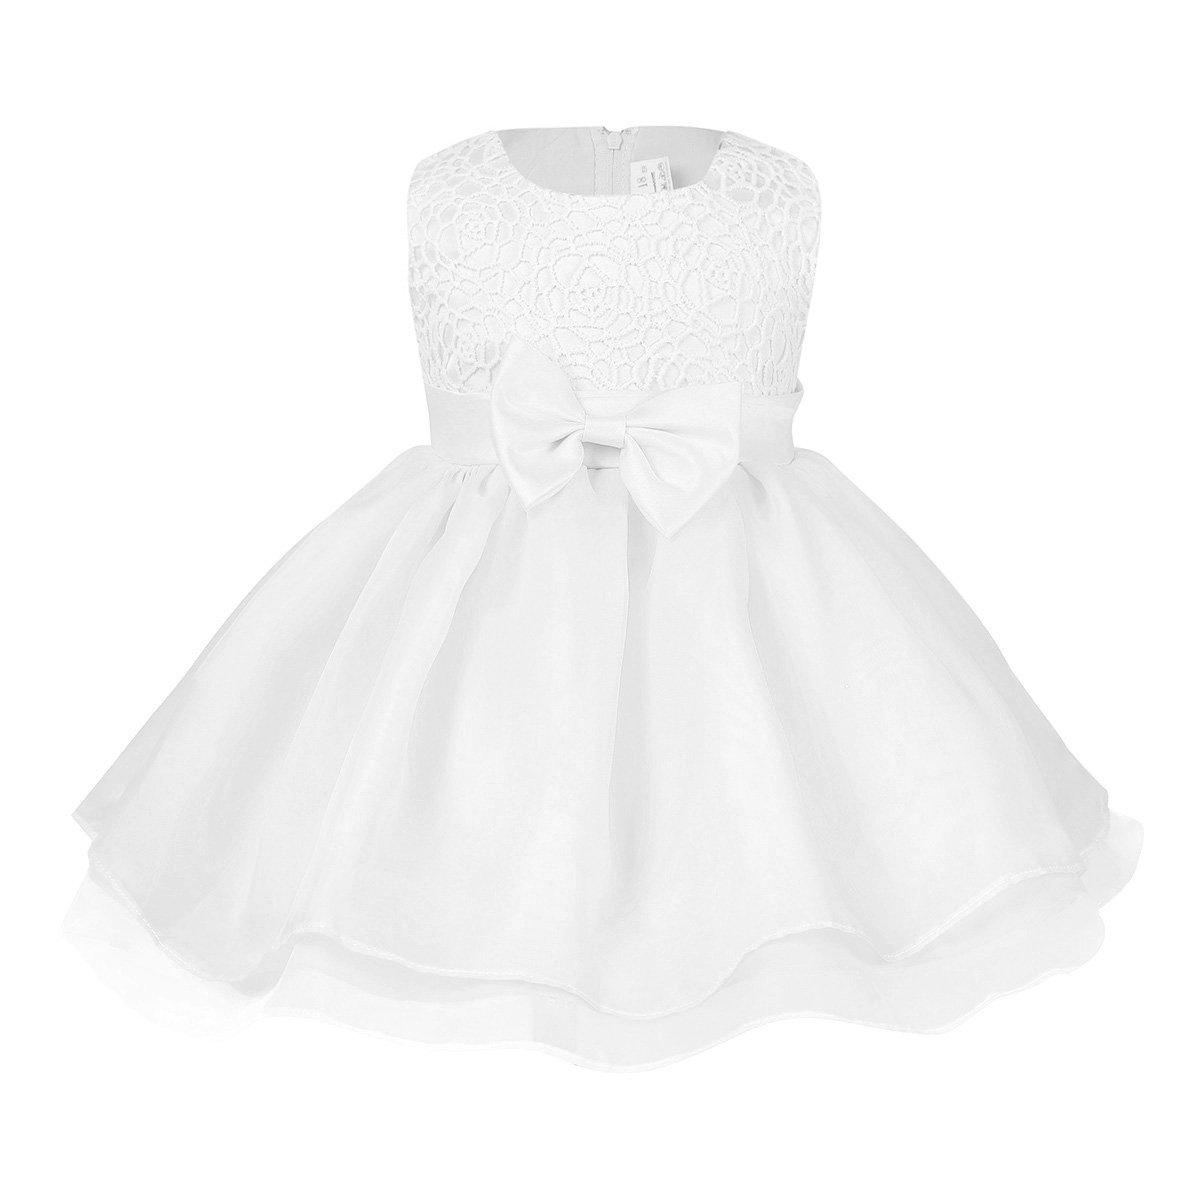 b8adff22a4cb7 freebily Bébé Princesse Fille Robe Robe De Cérémonie Habillée Blanc Robe  Baptême Bébé Tutu Fleur Robe de Danse Taille 6-24 Mois